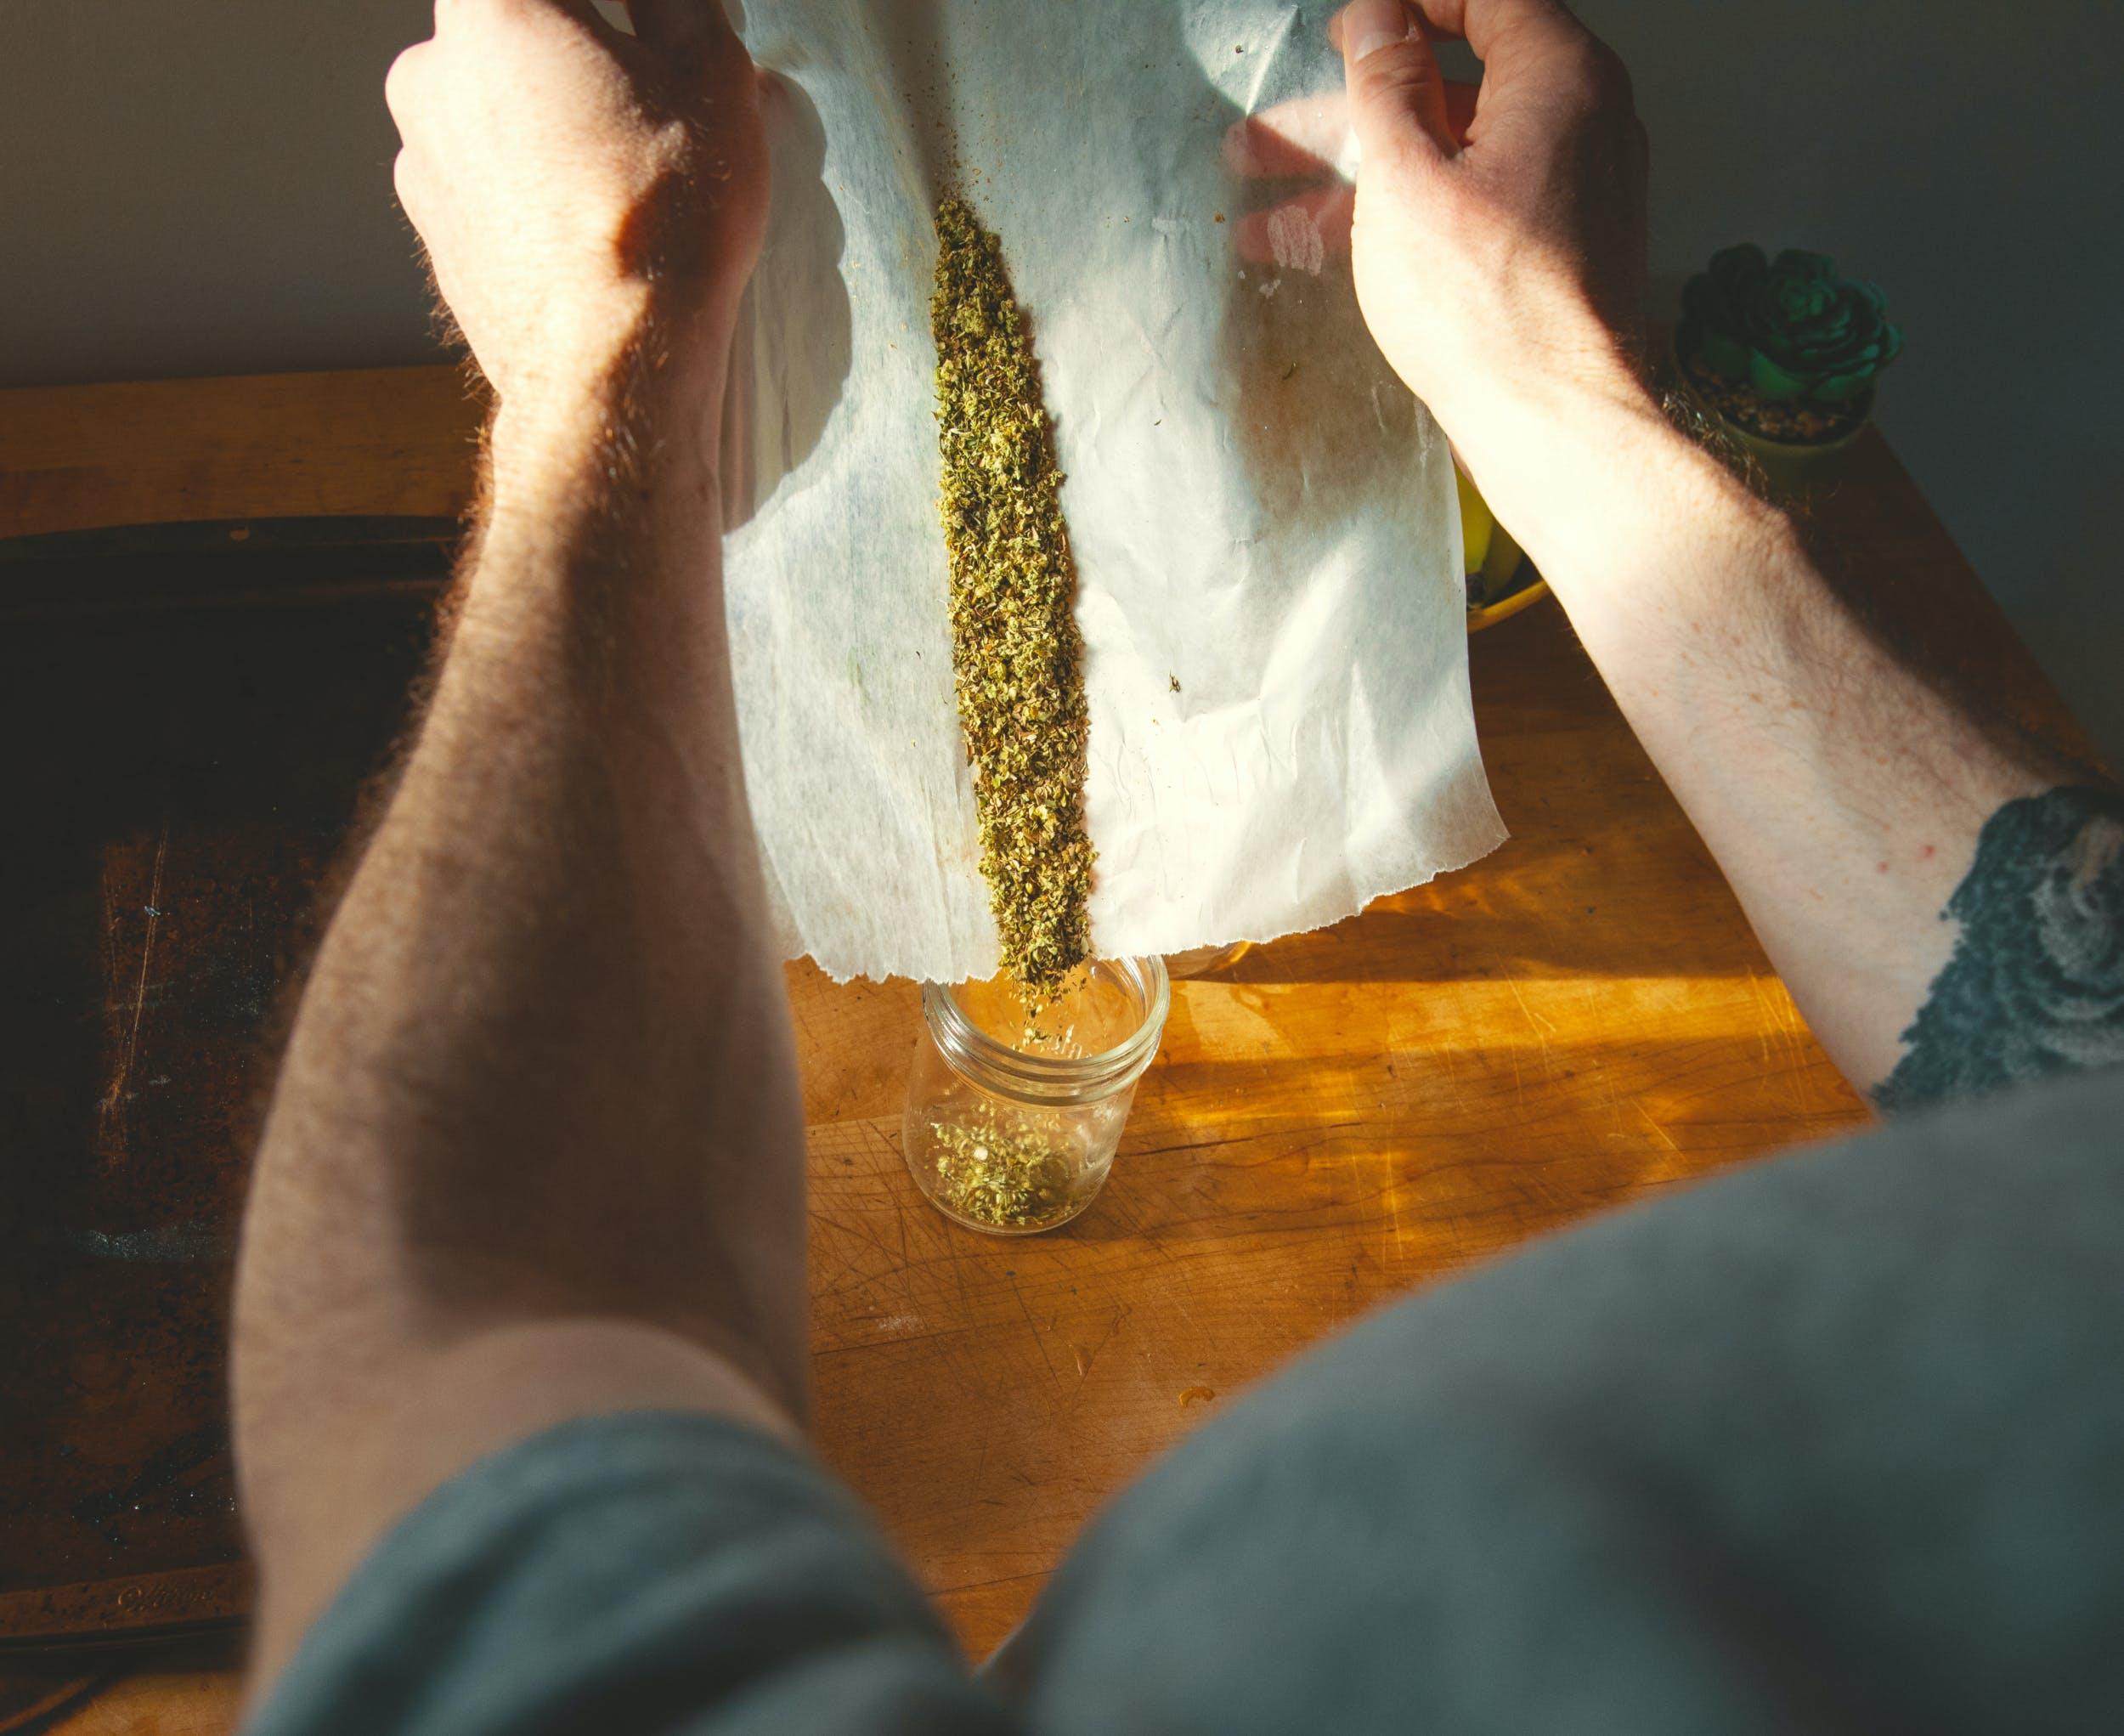 How to Make Cannabis Tincture 104 e1548365404958 Heres How to Make Cannabis Tincture in Your Own Kitchen